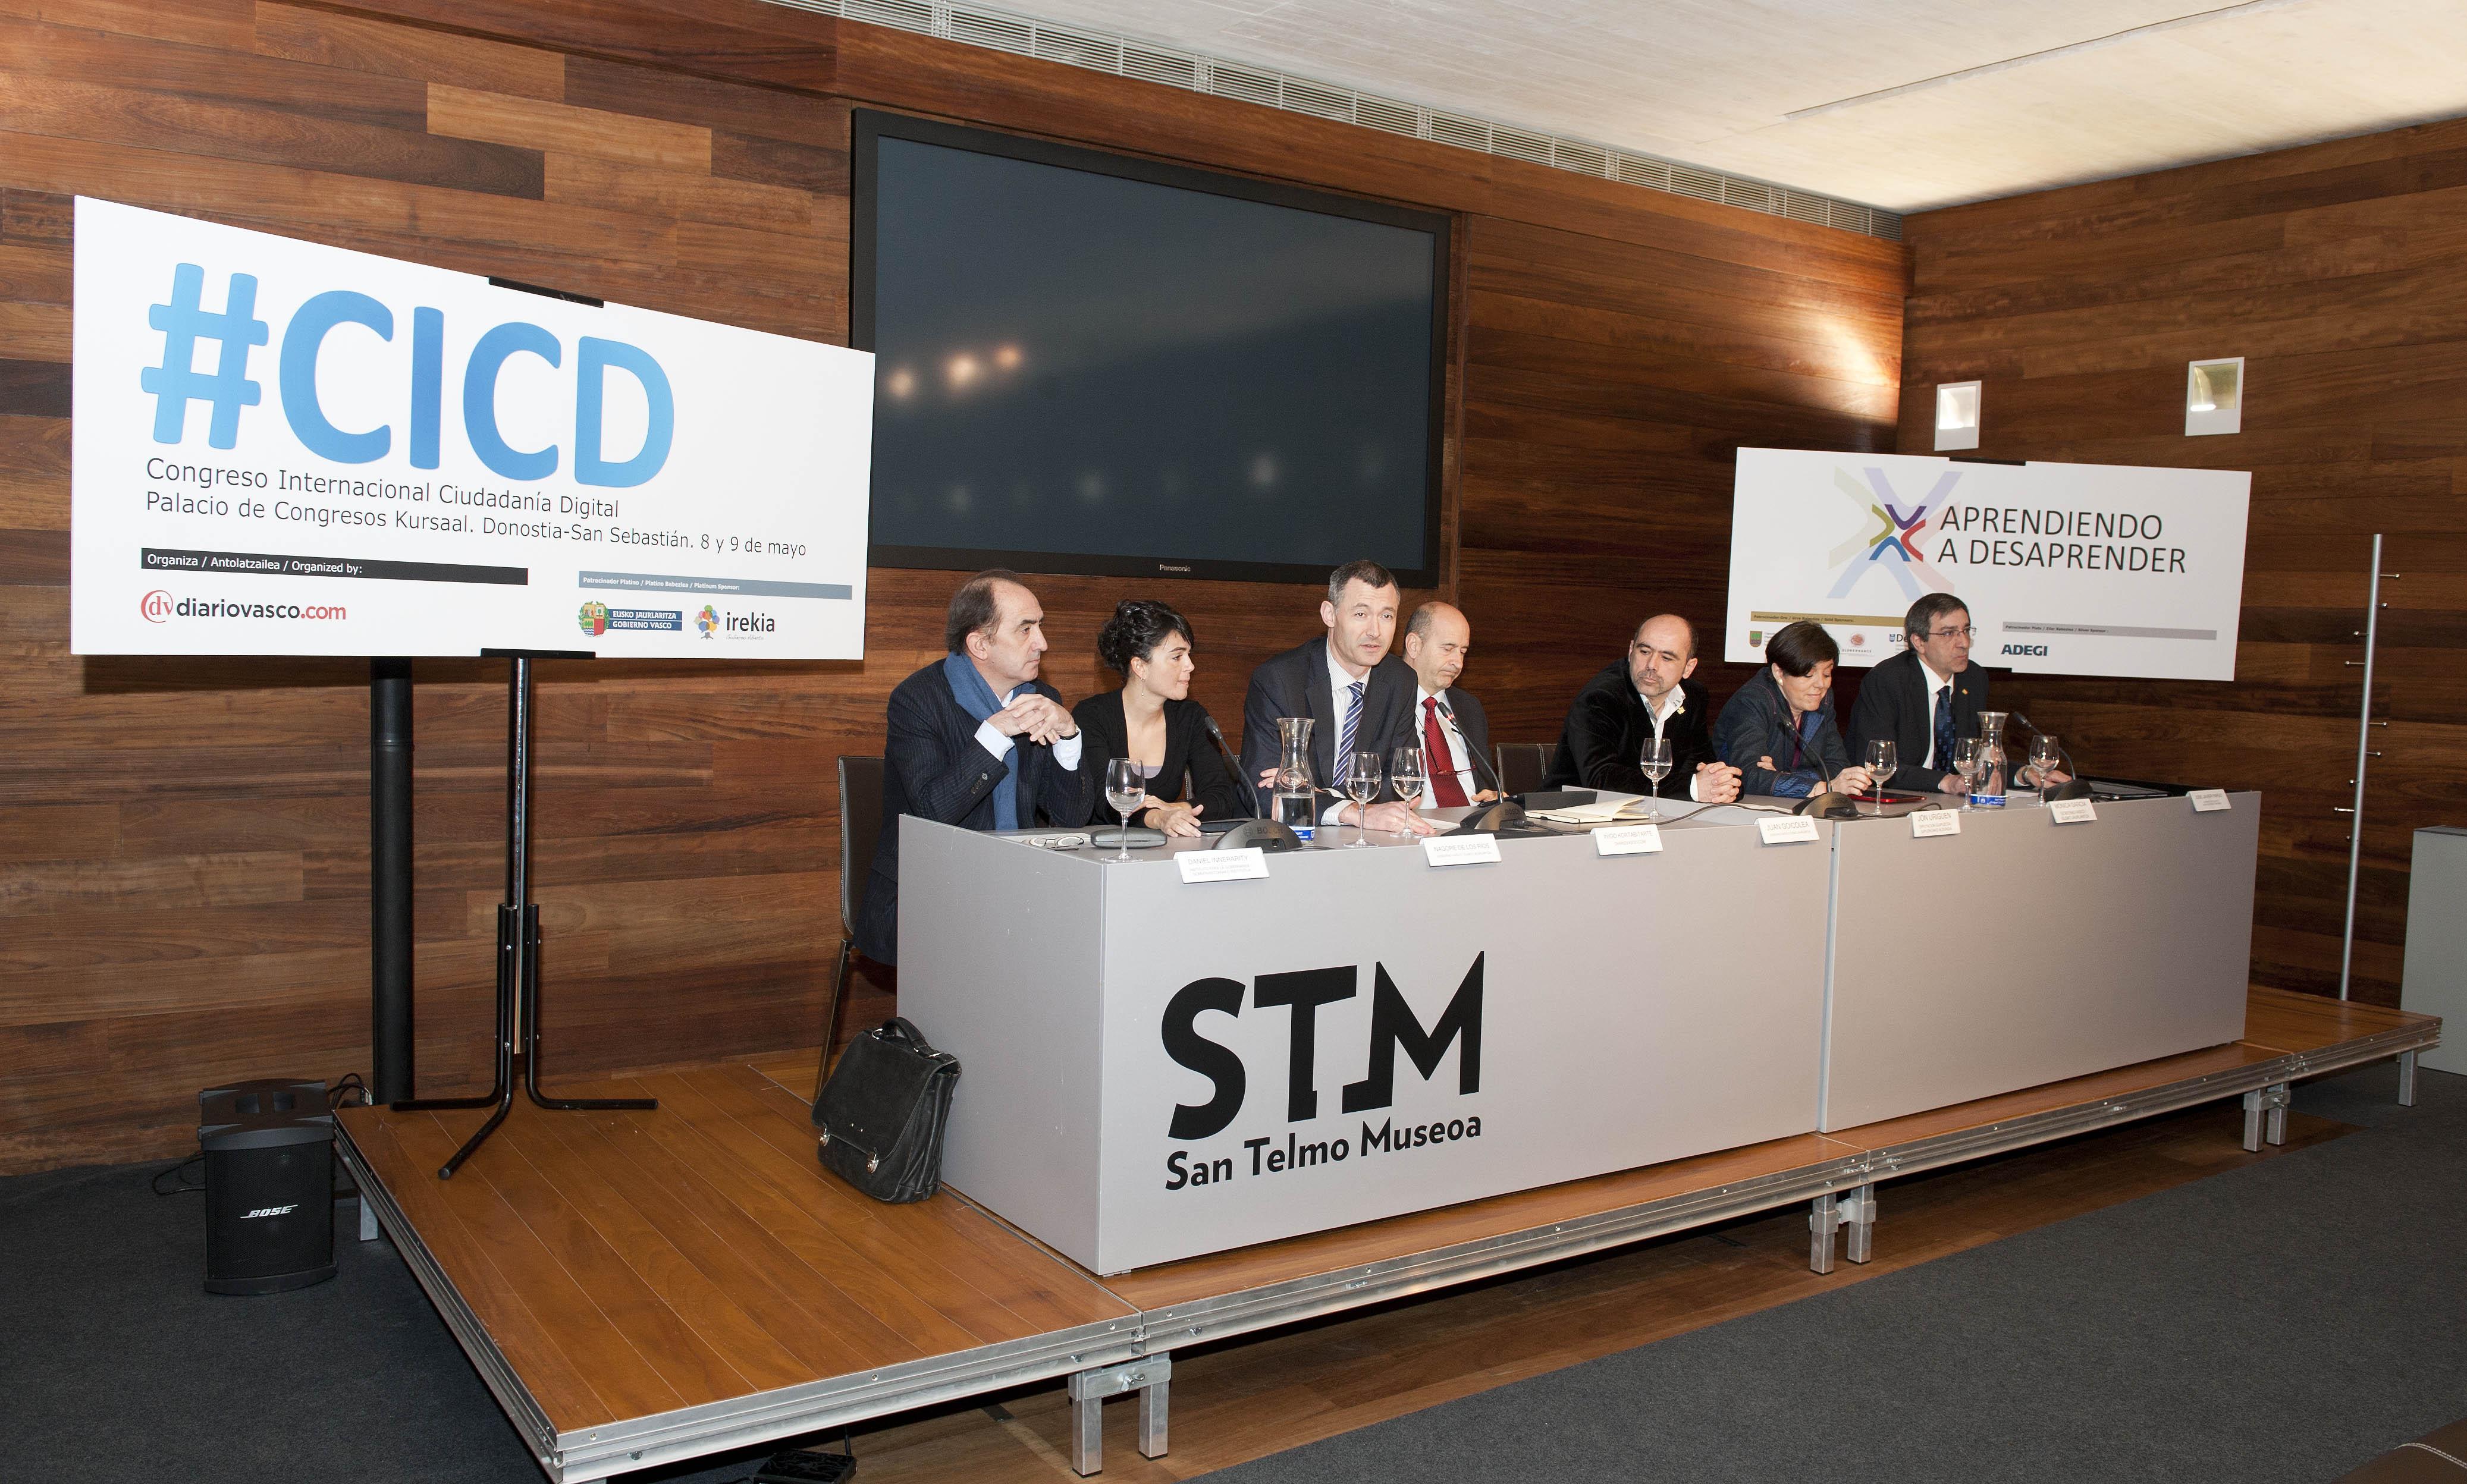 2012_03_12_congreso_ciudadania_digital_03.jpg